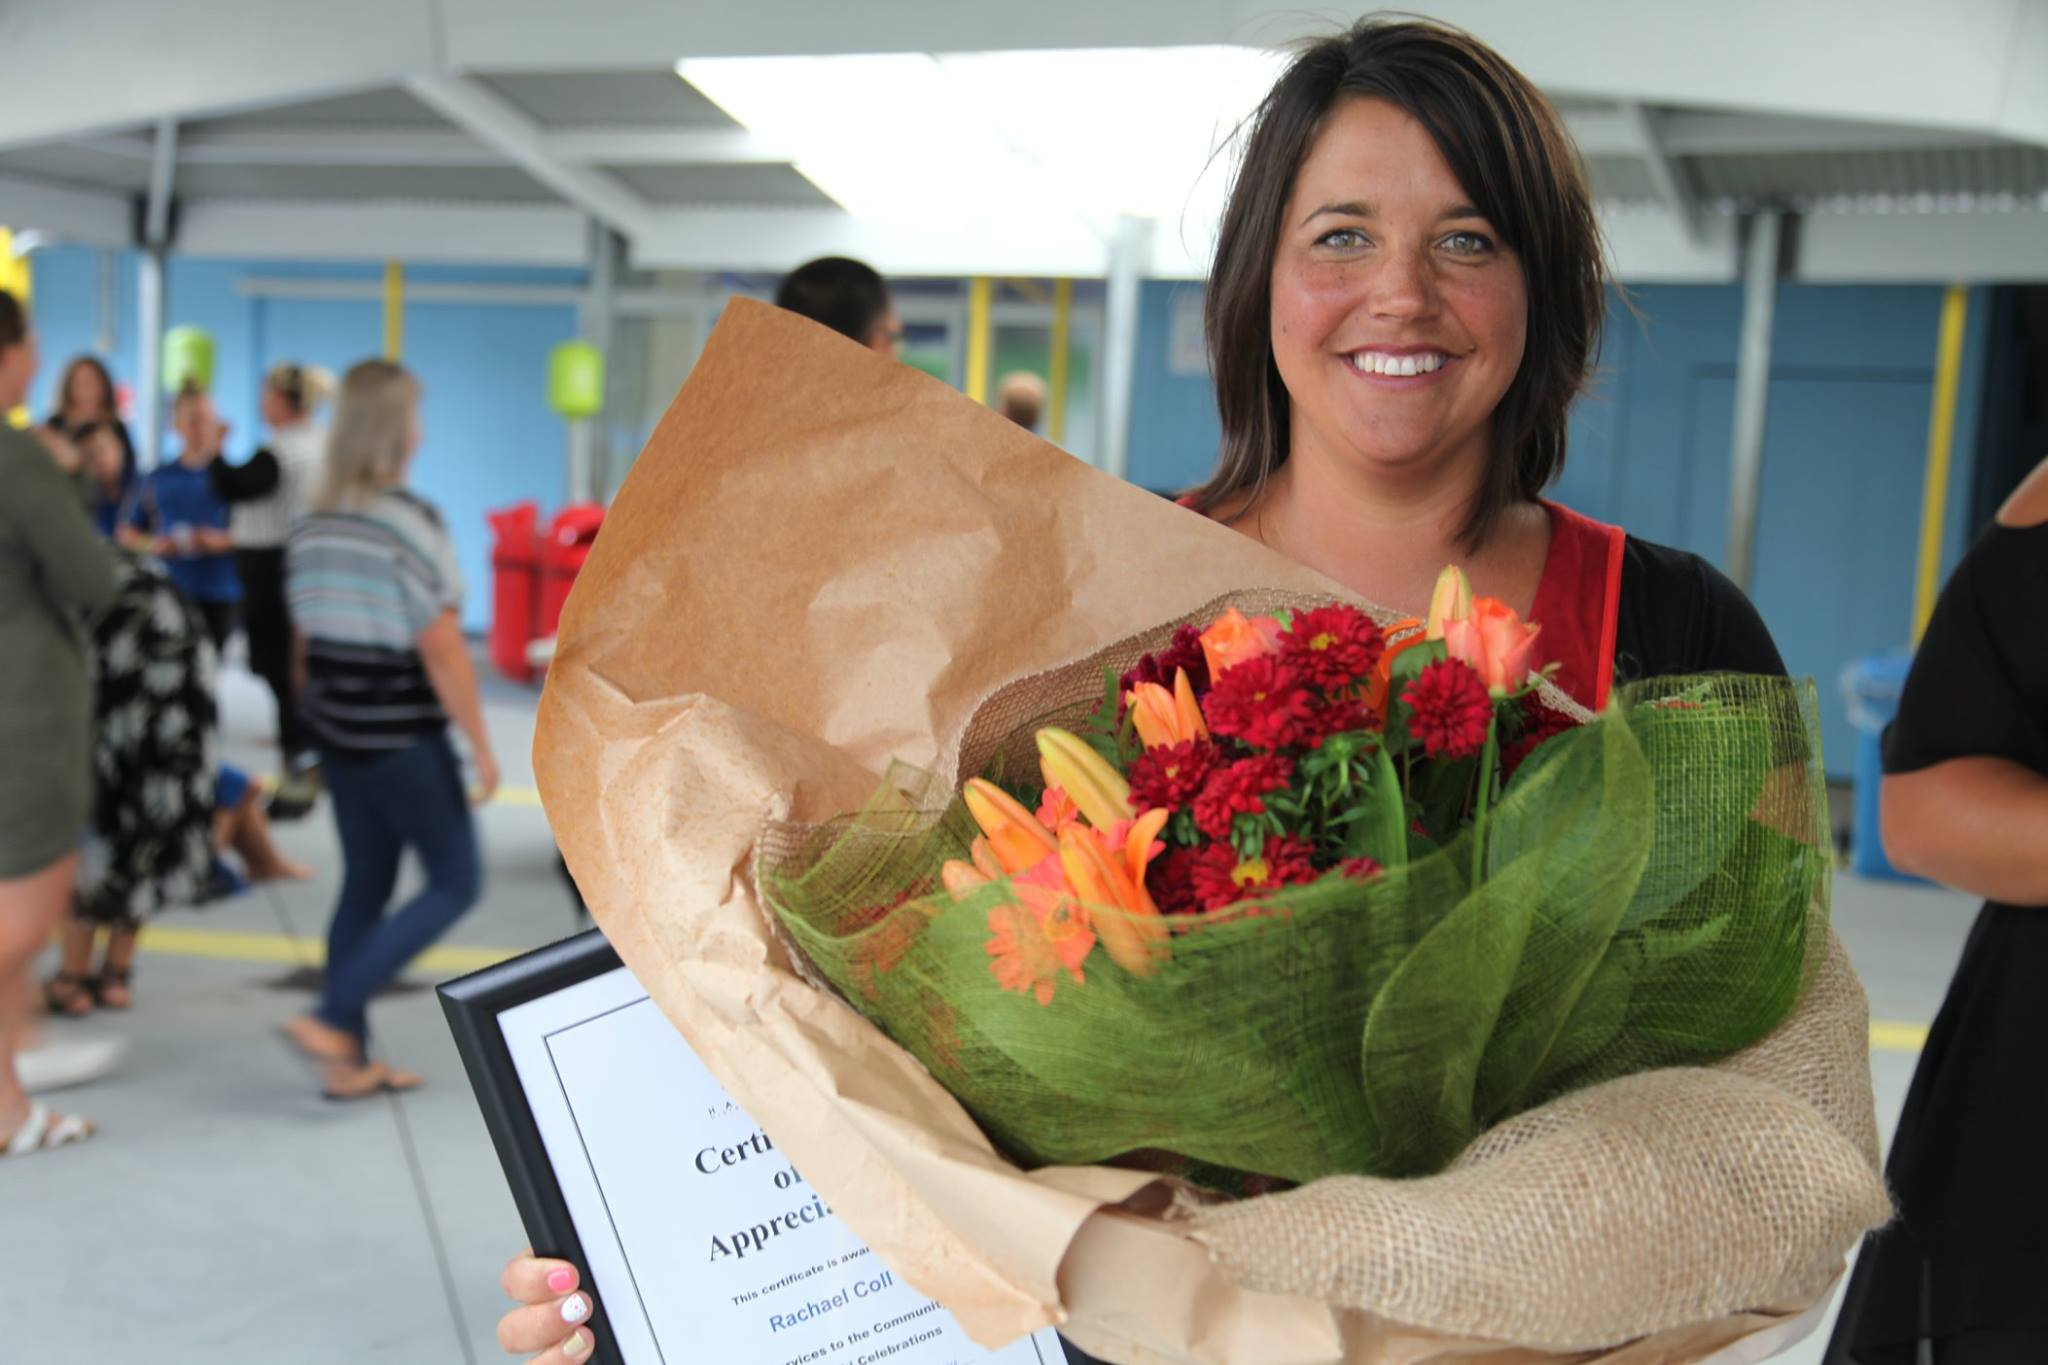 Congratulations Mrs Coll